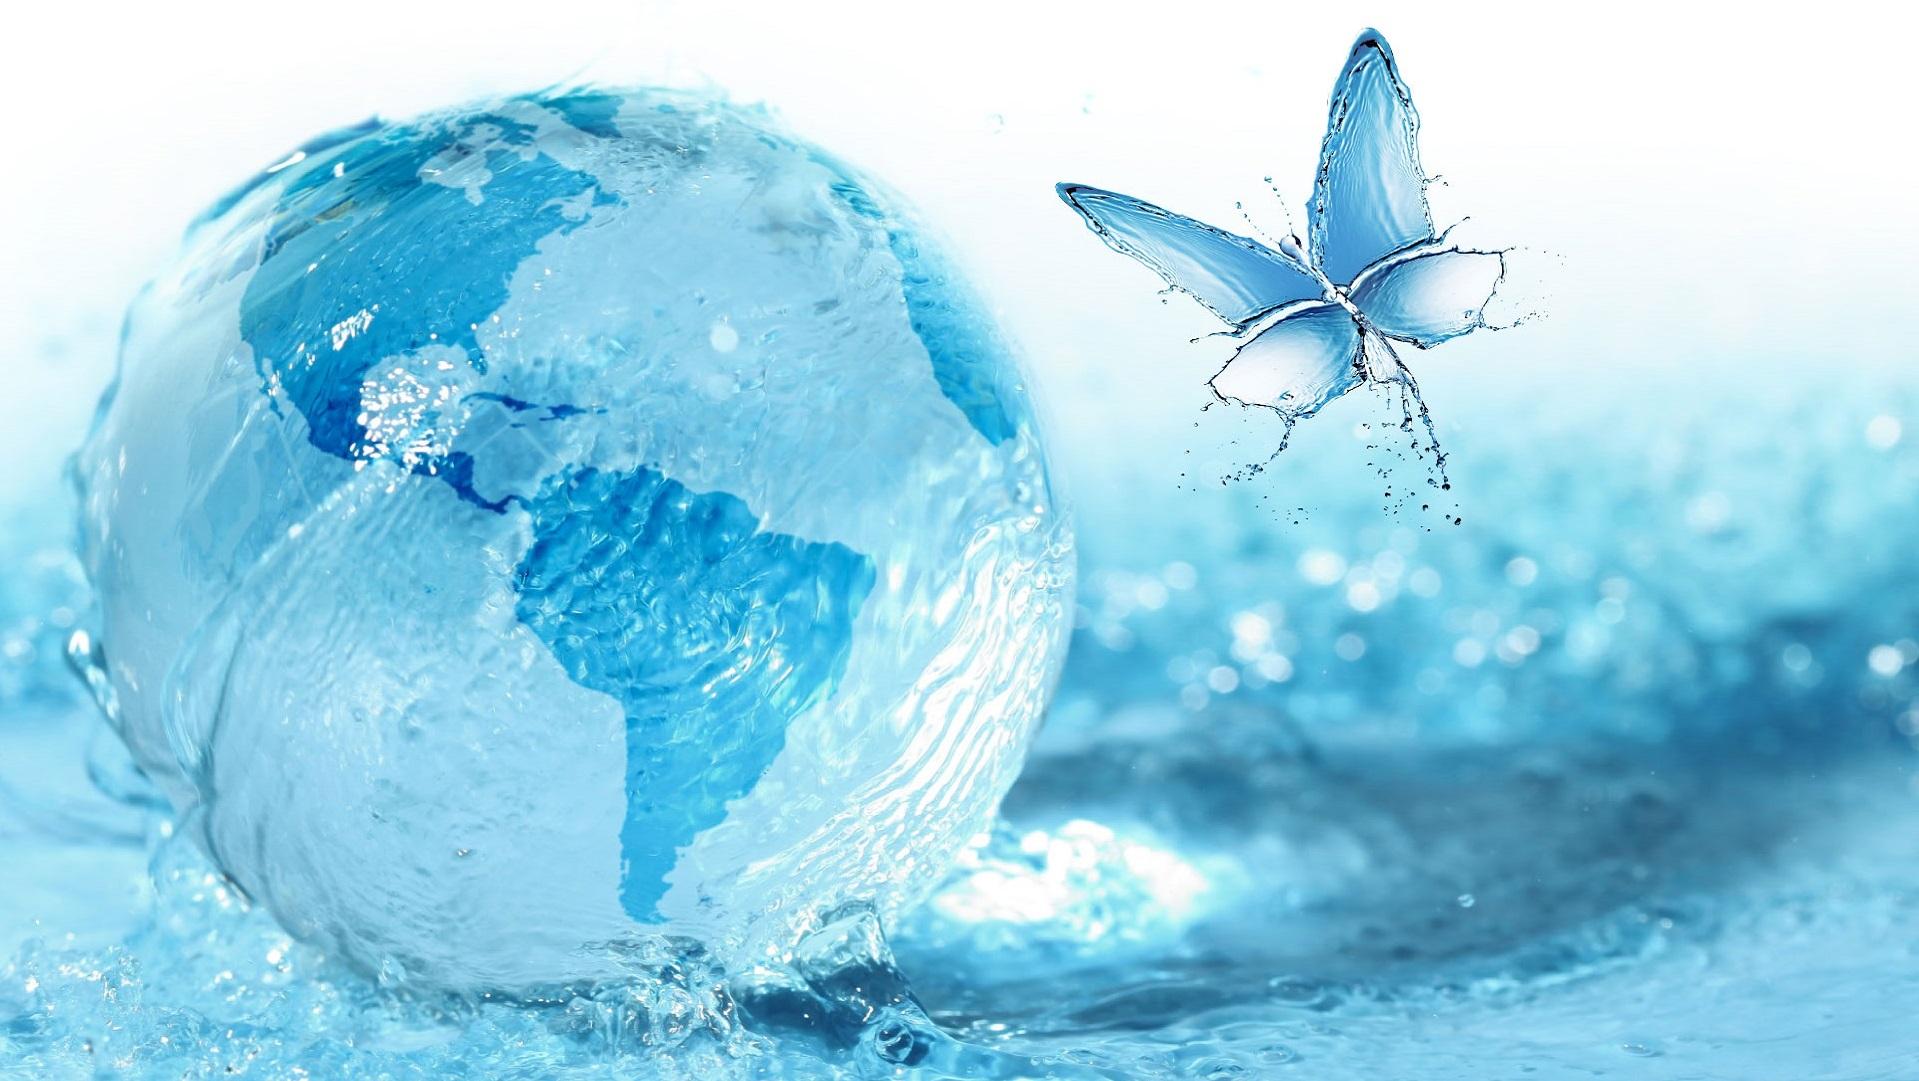 Aquality_forum_1920_1080.jpg